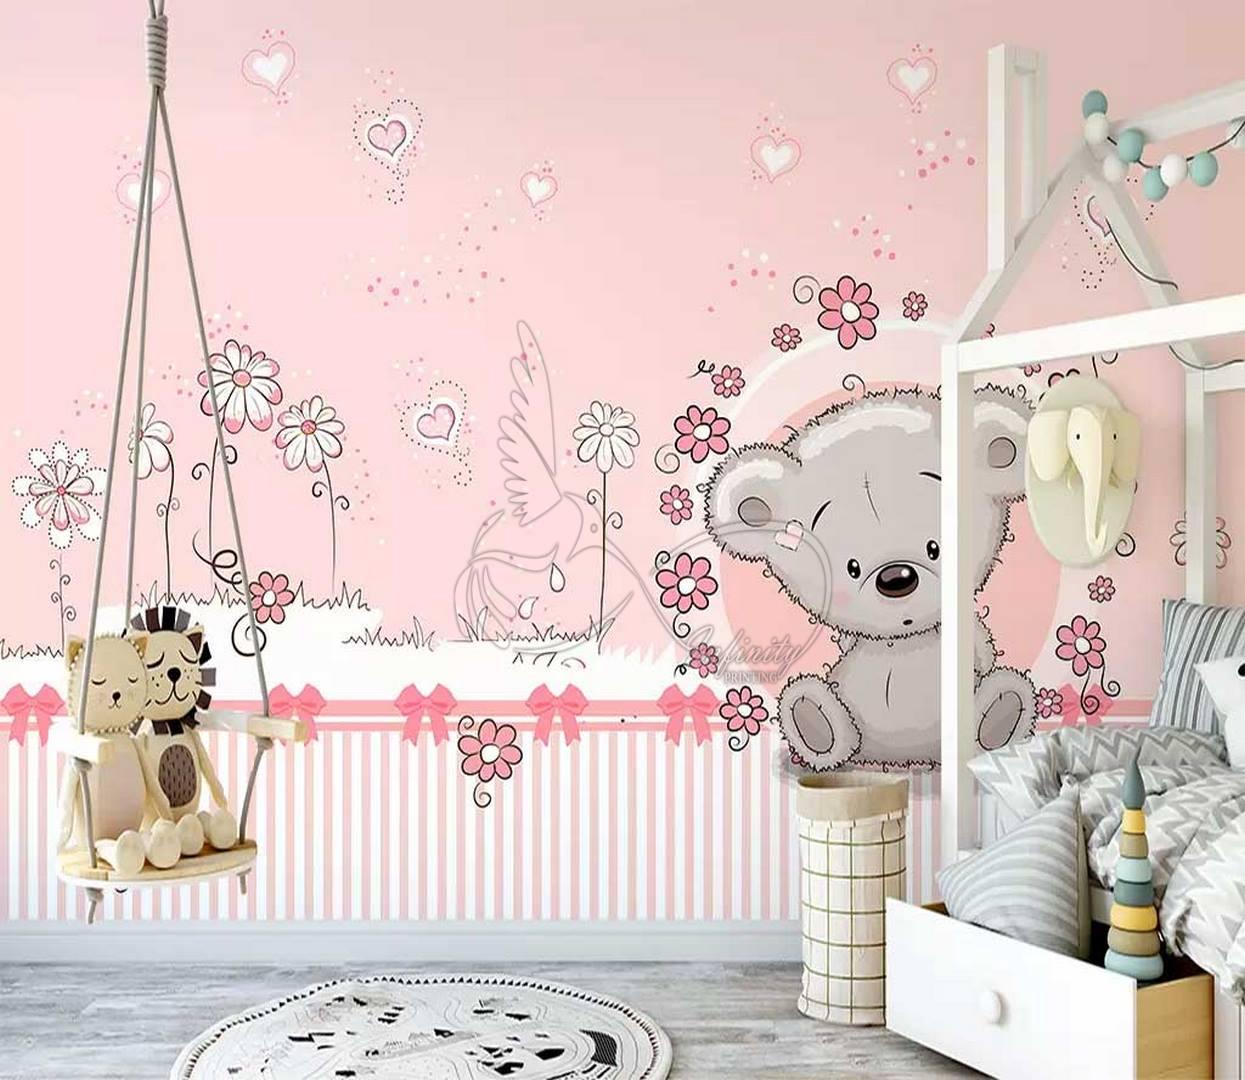 Fantasy child room design wall poster printing code 3141